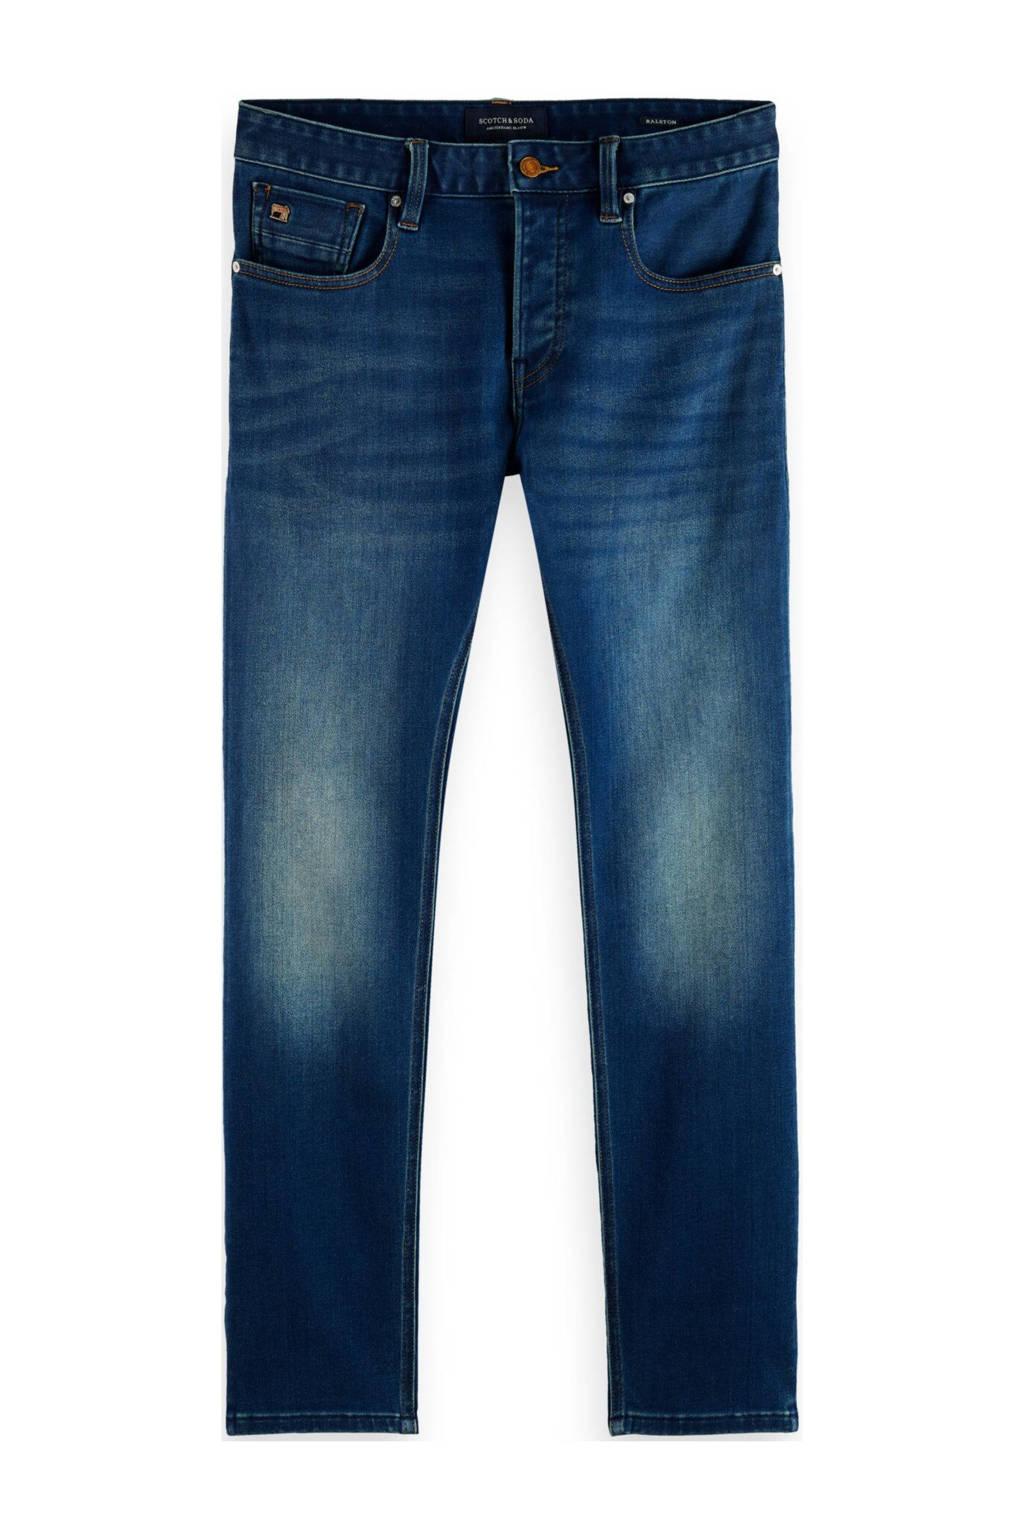 Scotch & Soda regular fit jeans Ralston blue future, Blue Future